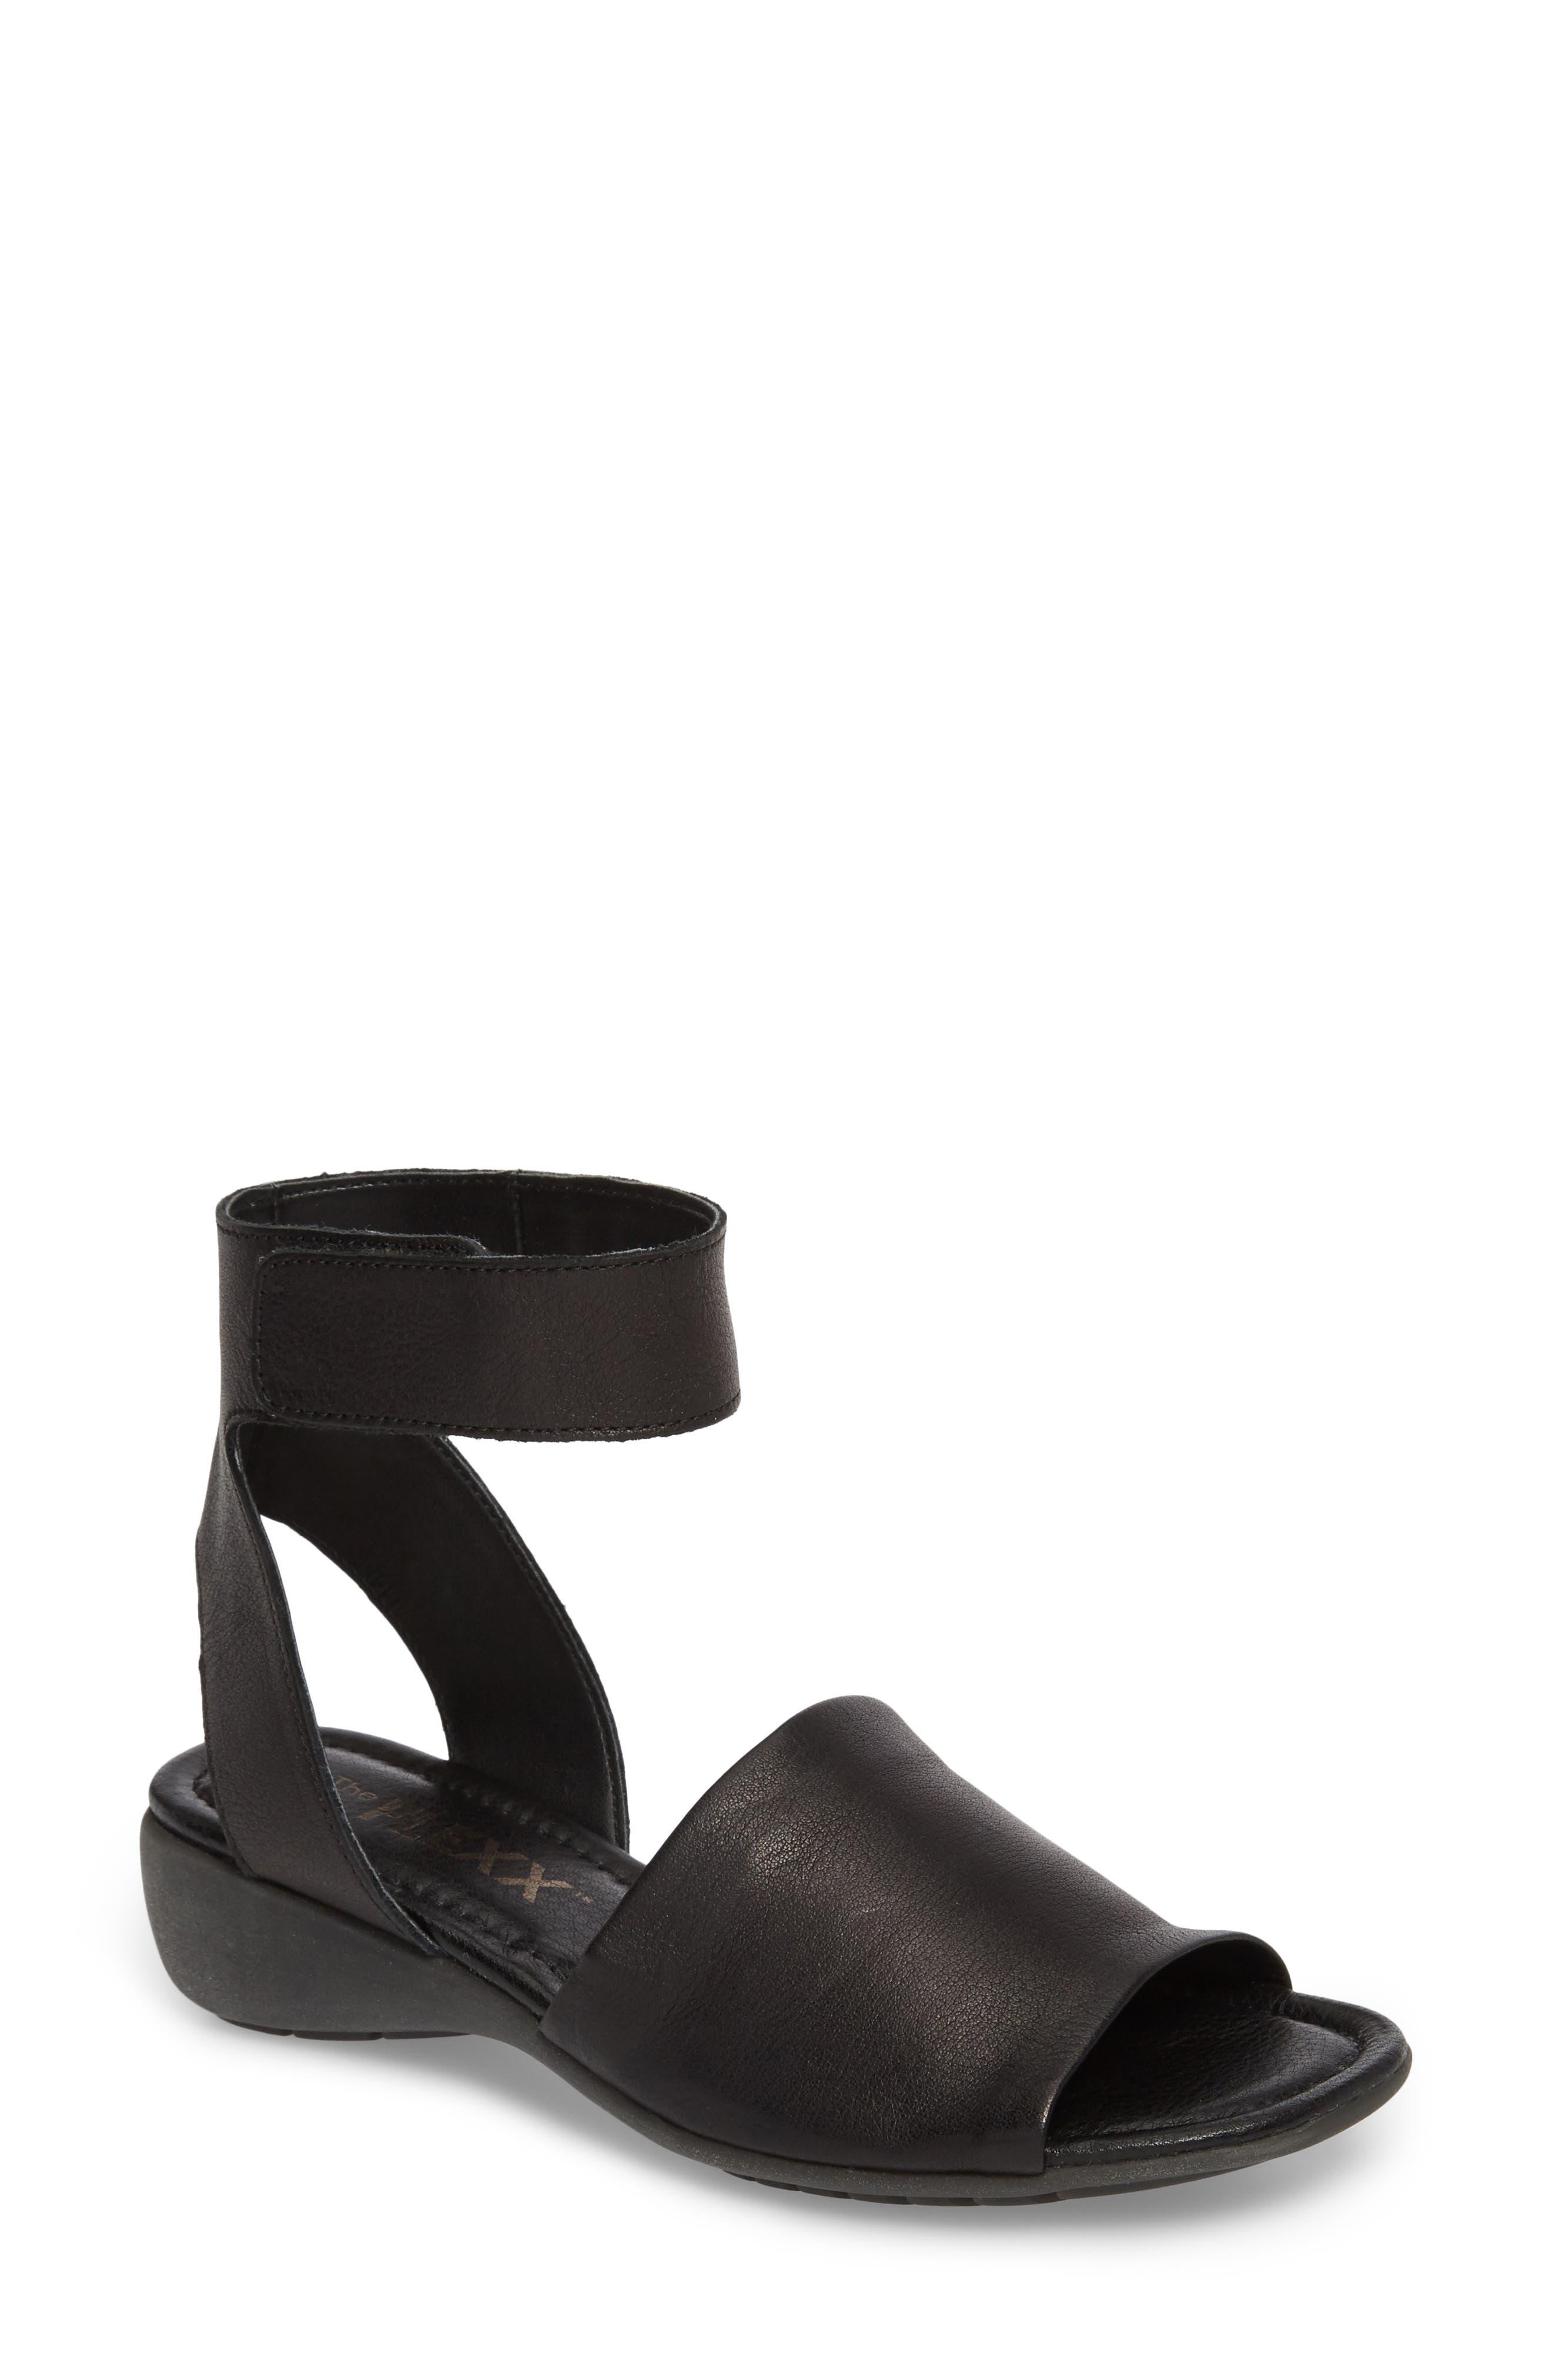 'Beglad' Leather Ankle Strap Sandal,                             Main thumbnail 1, color,